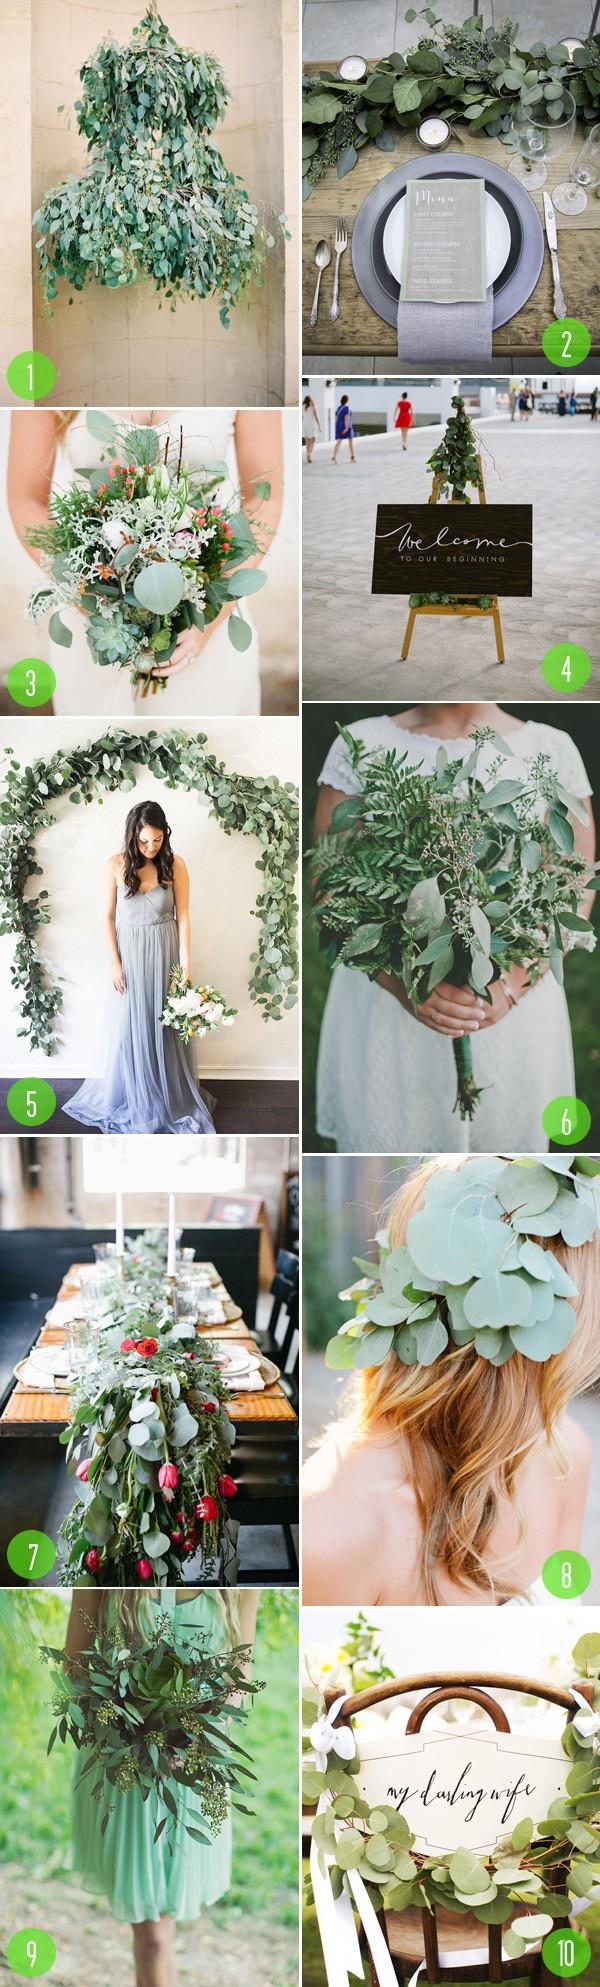 top 10: eucalyptus details